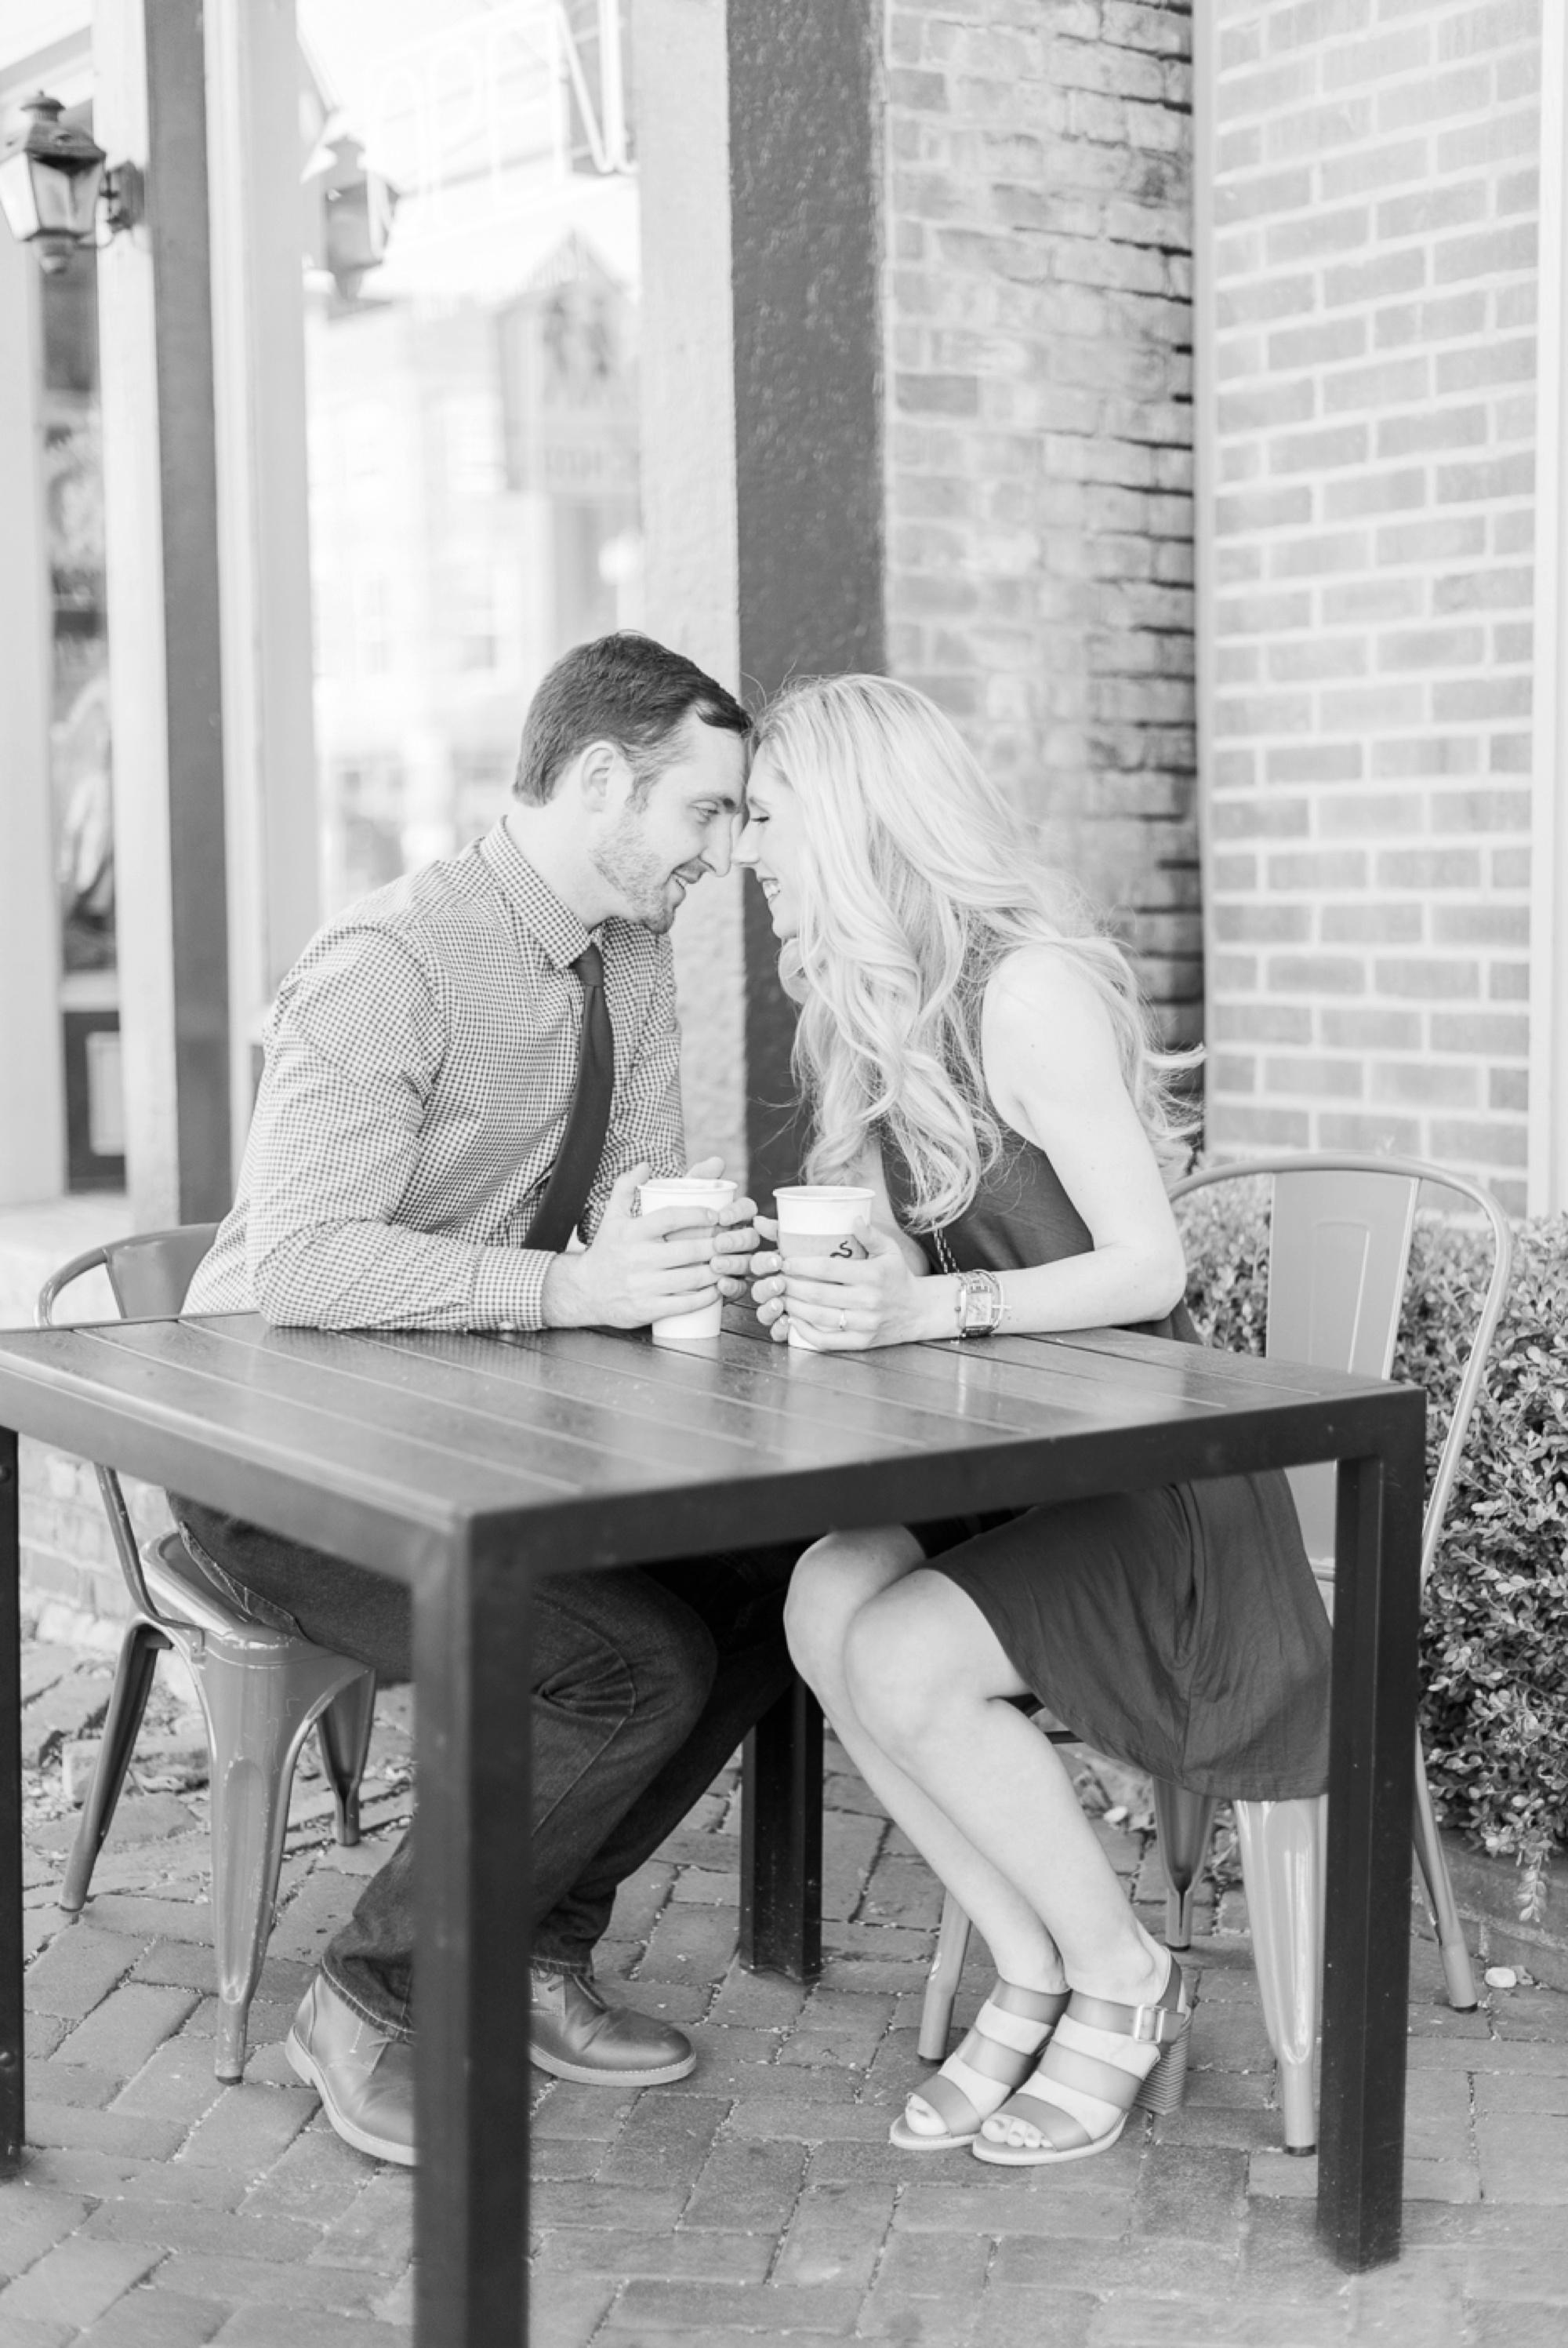 german-village-engagement-session-columbus-ohio-wedding-photographer-65.jpg